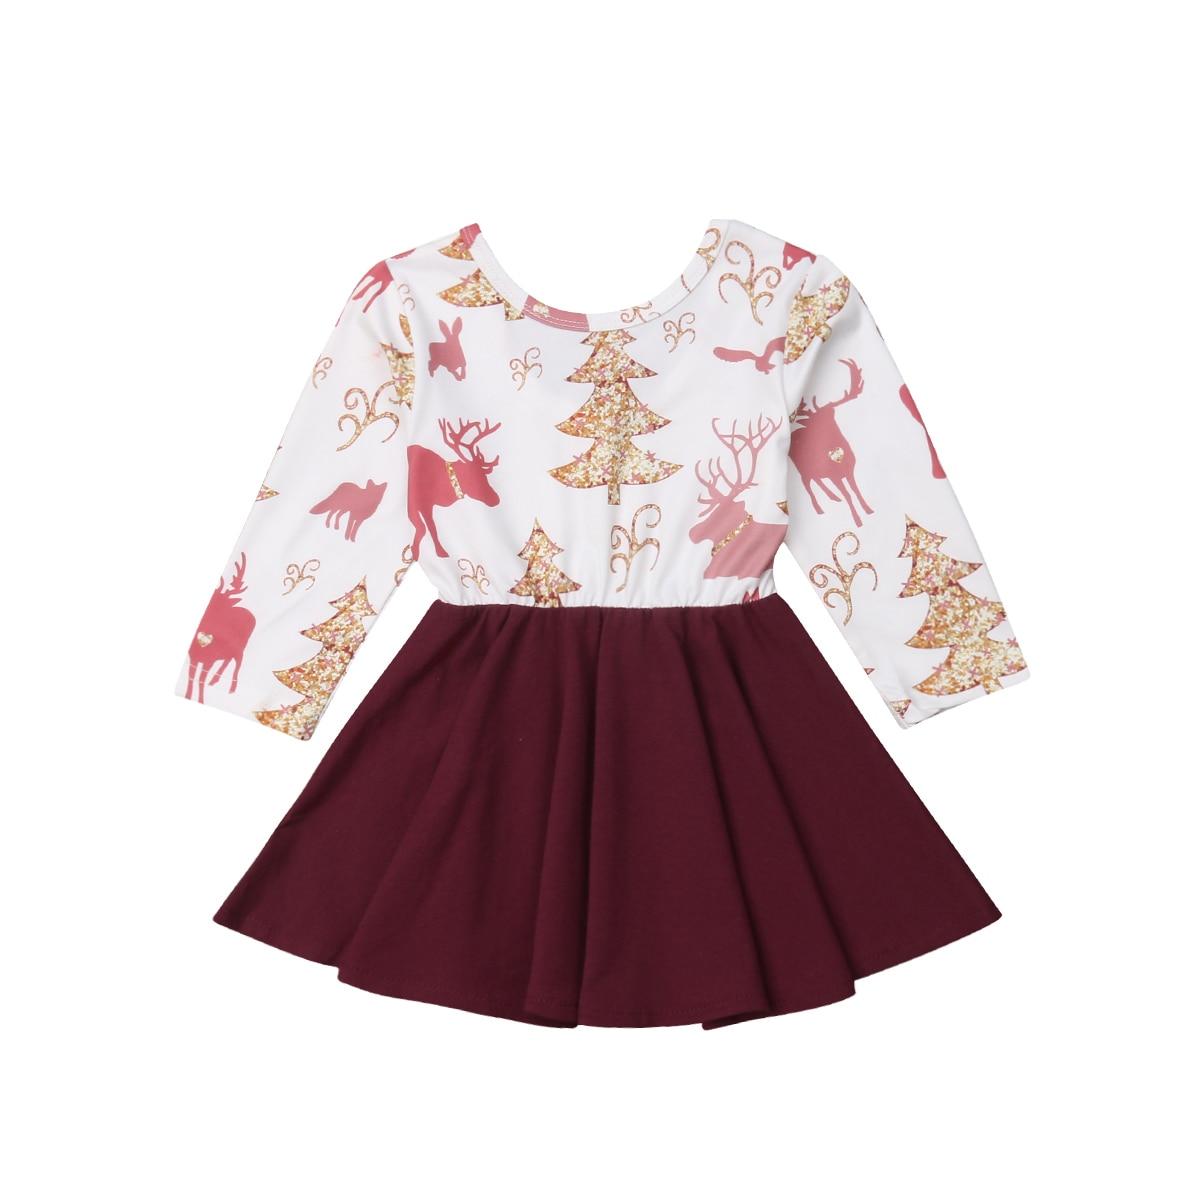 2019 Happy New Year Toddler Baby Girls Kids Princess Christmas Dress -4407